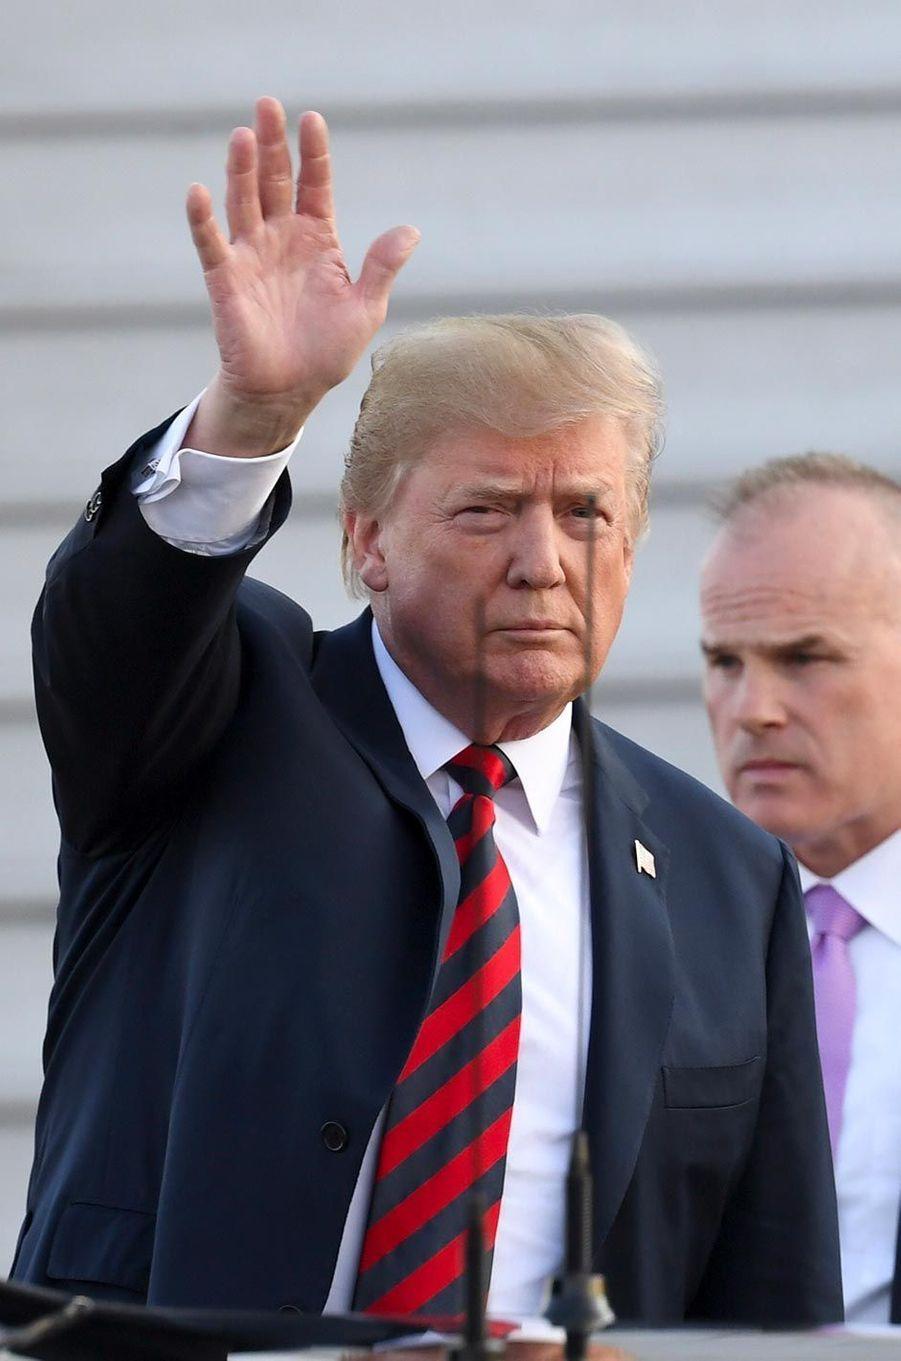 Donald Trump arrivant en Finlande, le 15 juillet 2018.